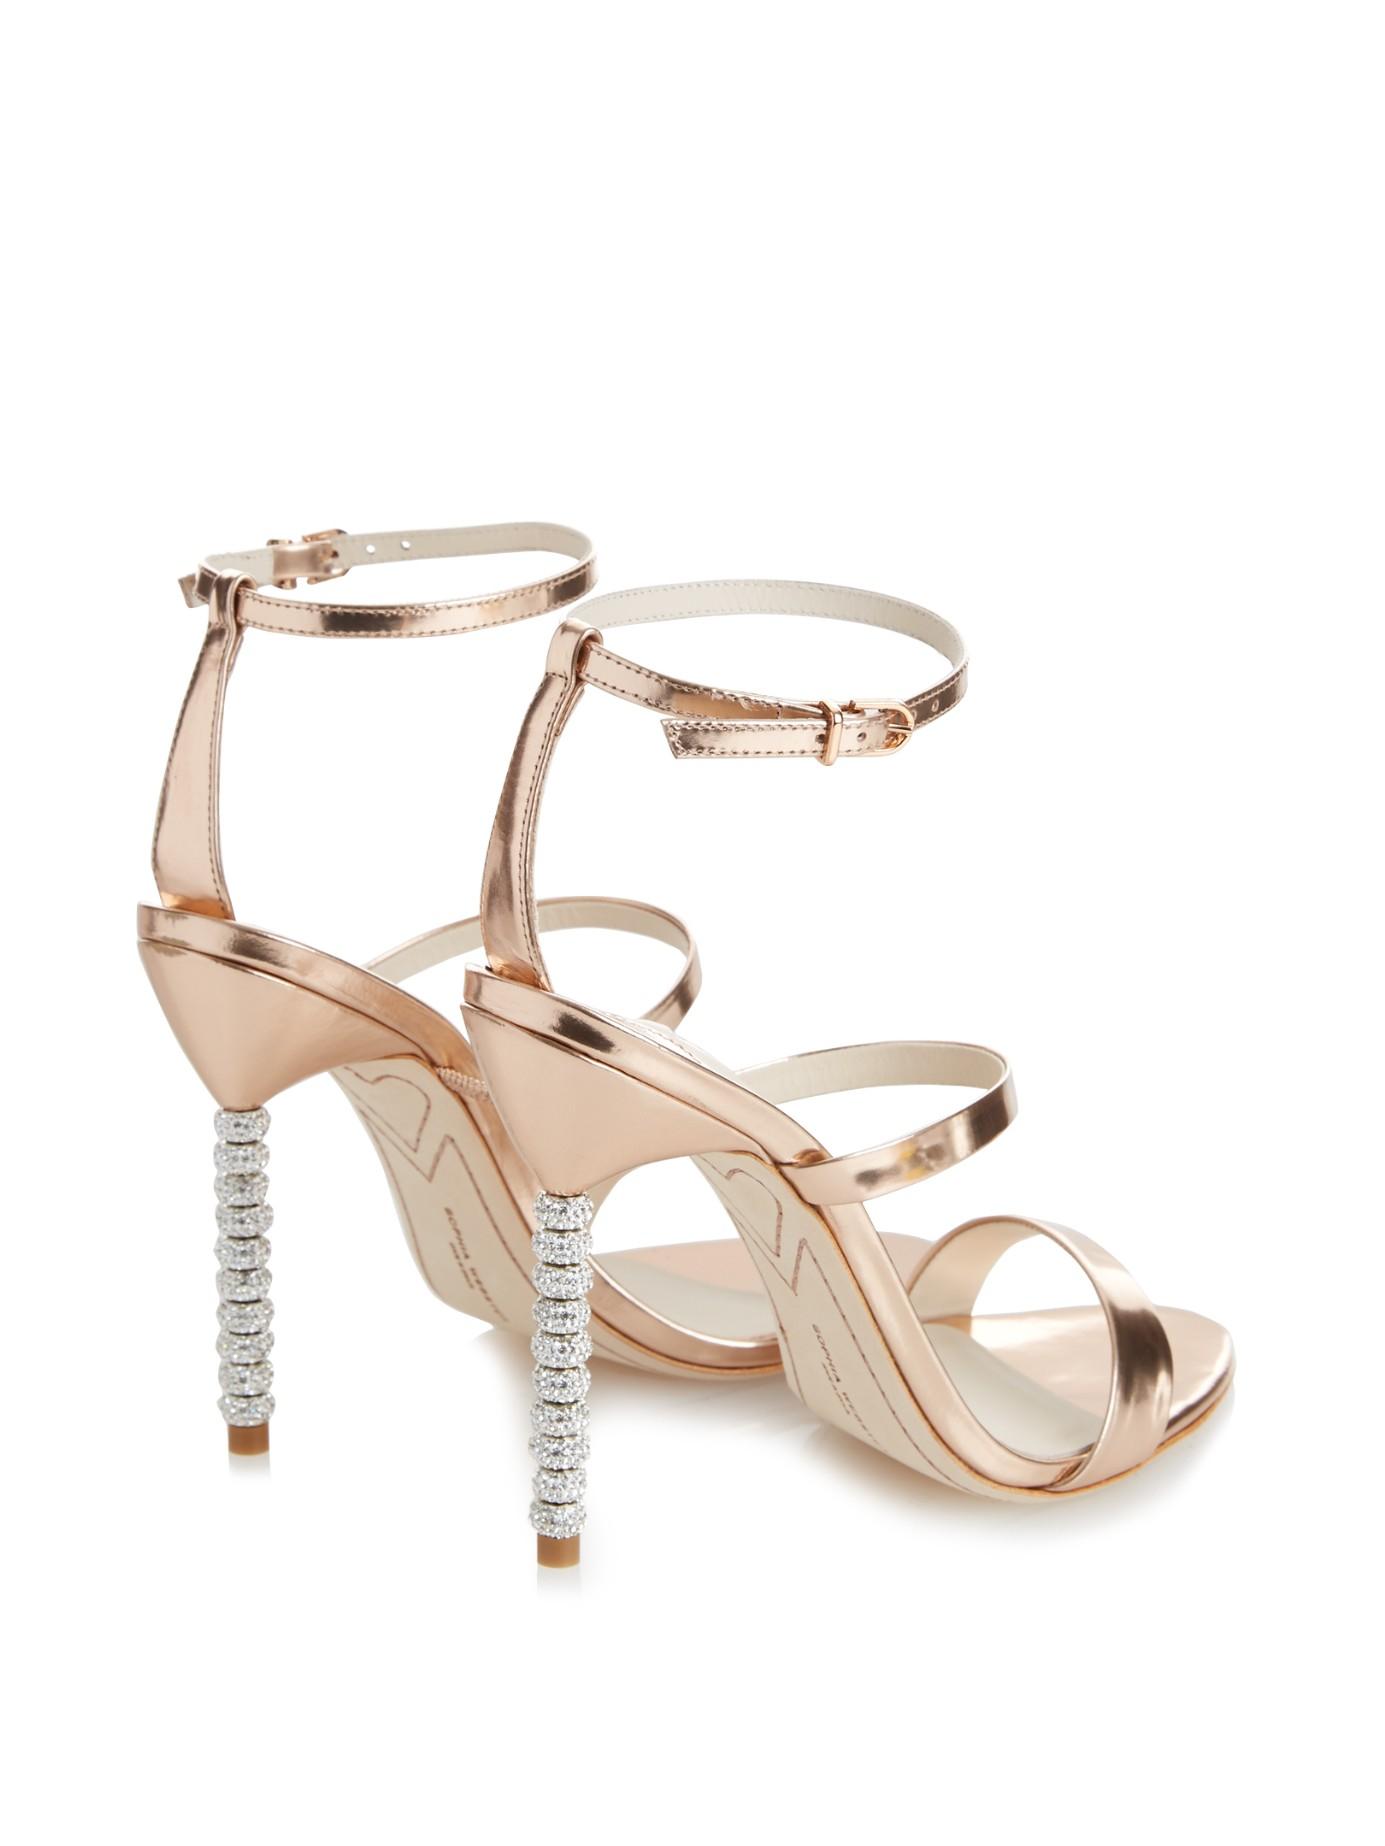 2ba8463dc Lyst - Sophia Webster Rosalind Crystal-Heel Metallic Leather Sandals in  Metallic